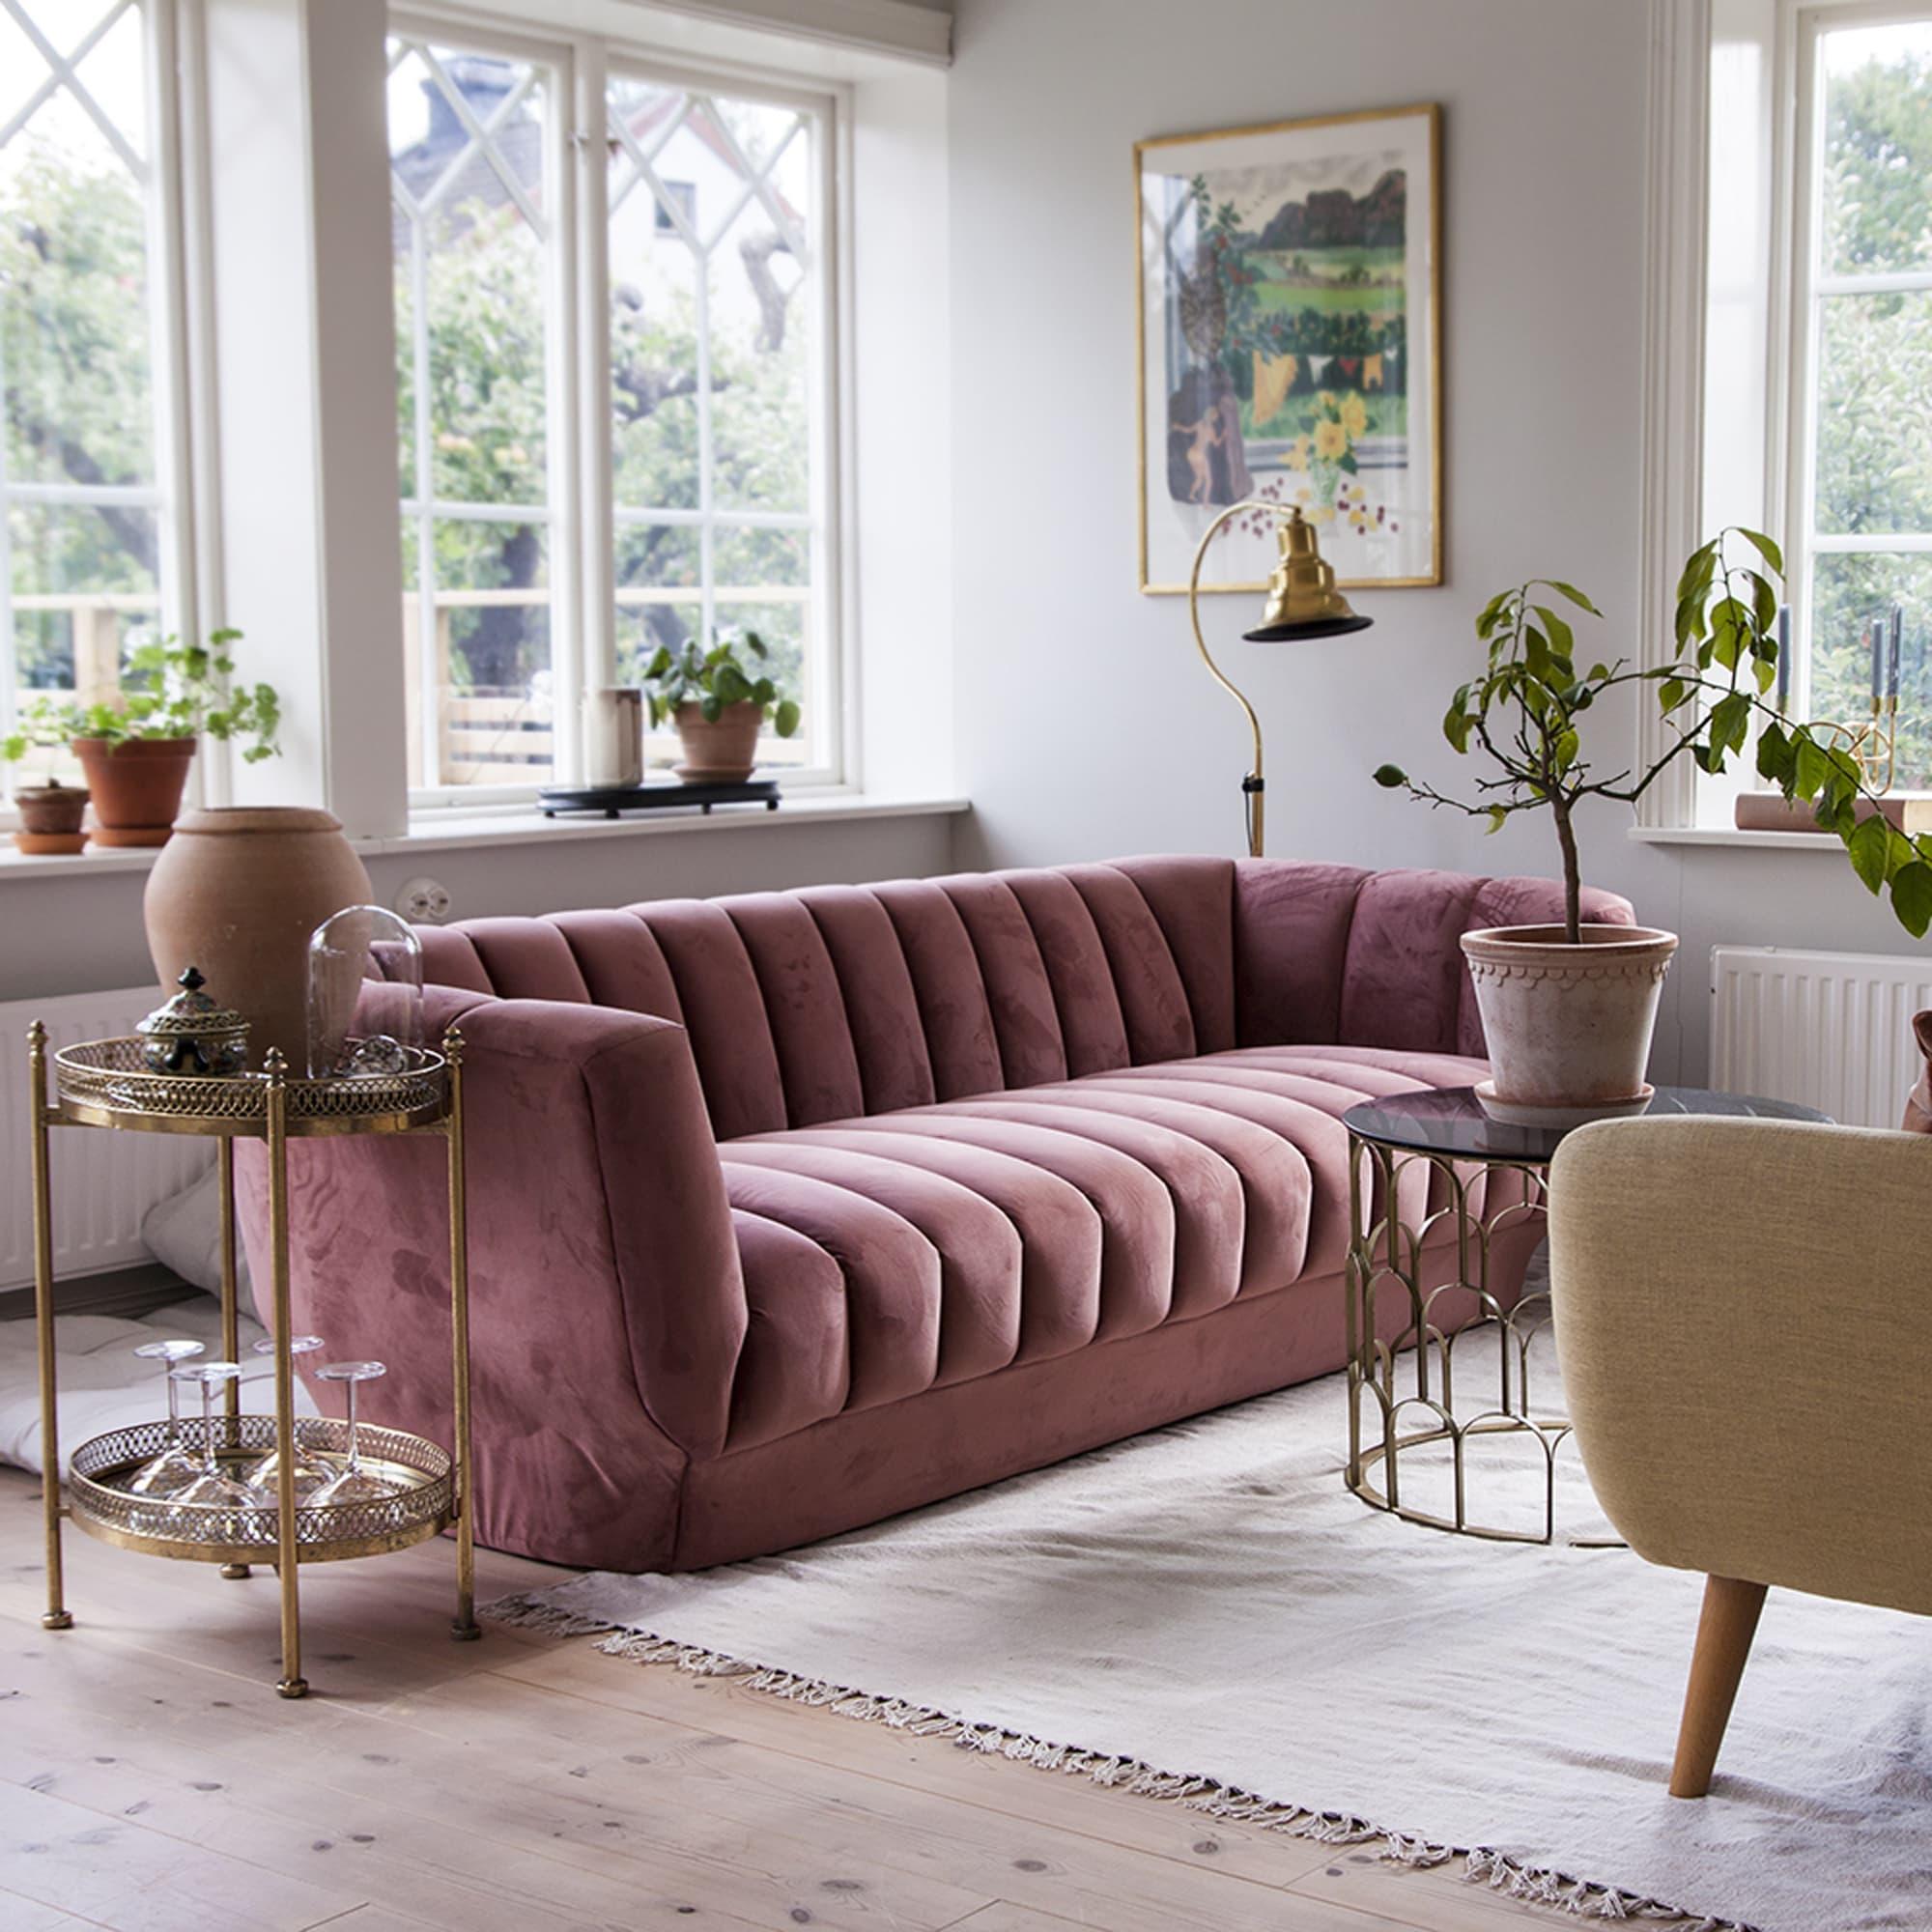 Scandinavian Design Swedish Ar Deco Home Tour Apartment Therapy